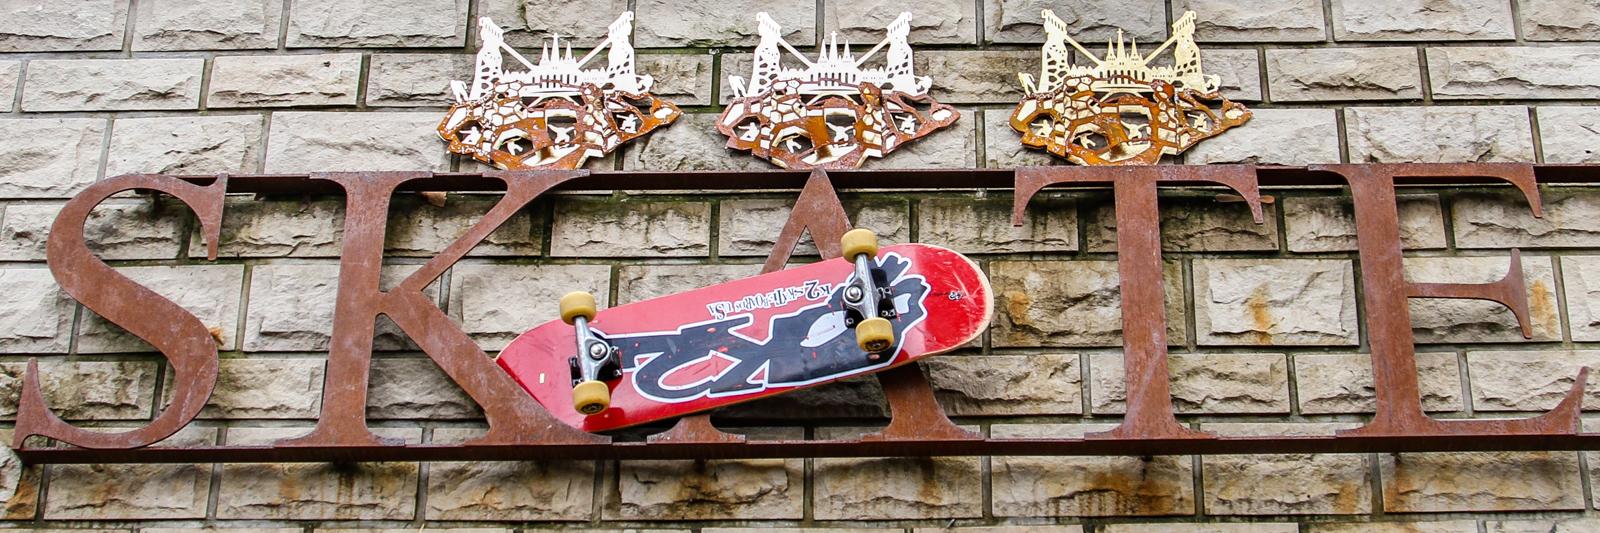 petrusse skatepark -